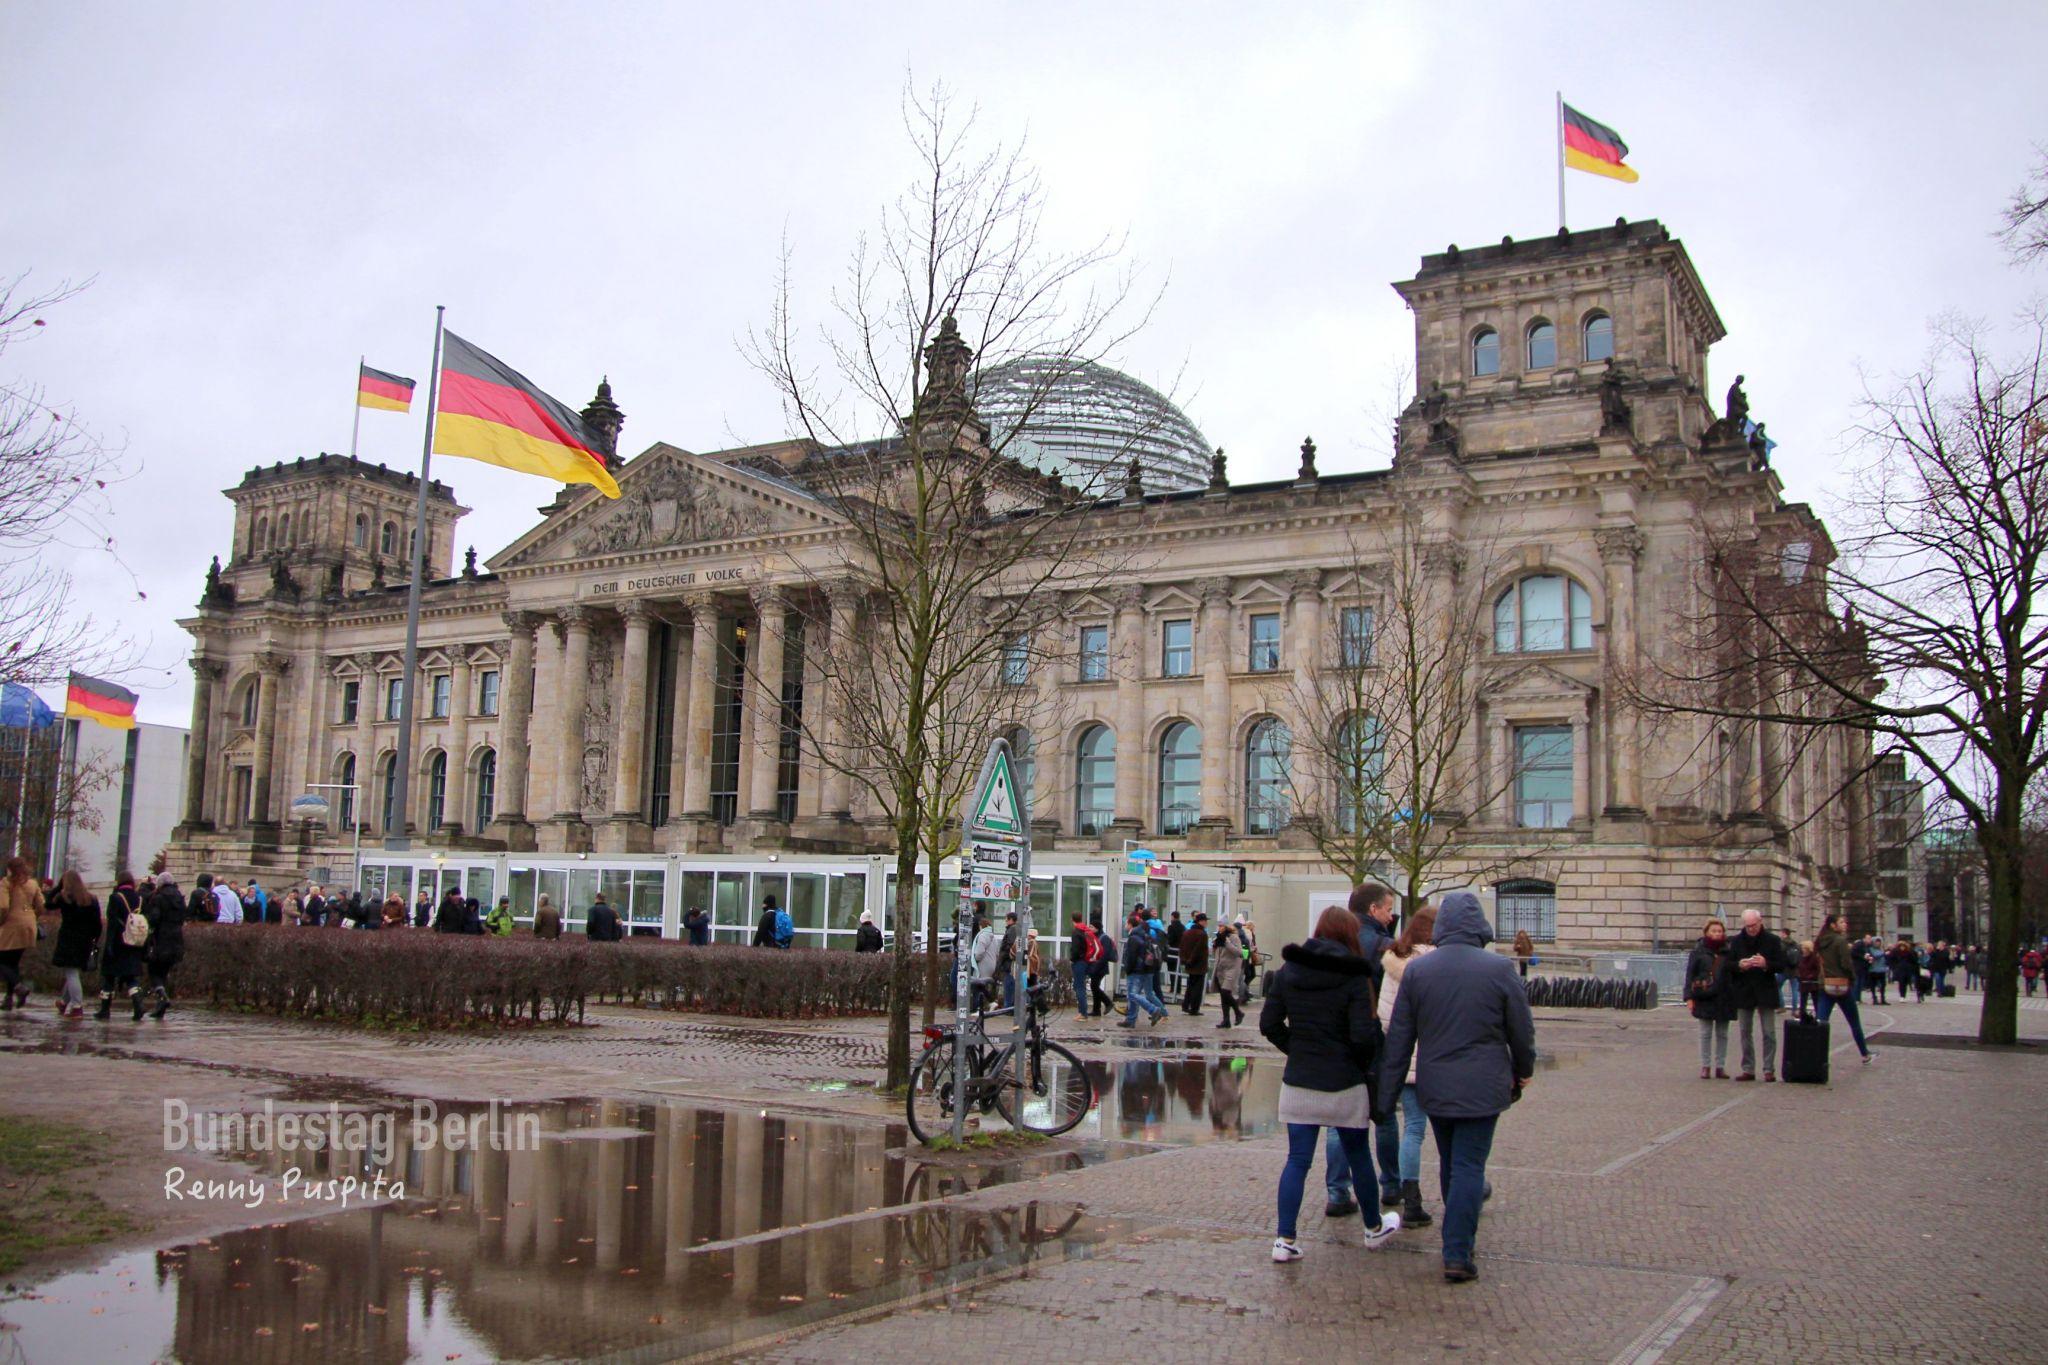 Bundestag, Berlin - Germany, Germany